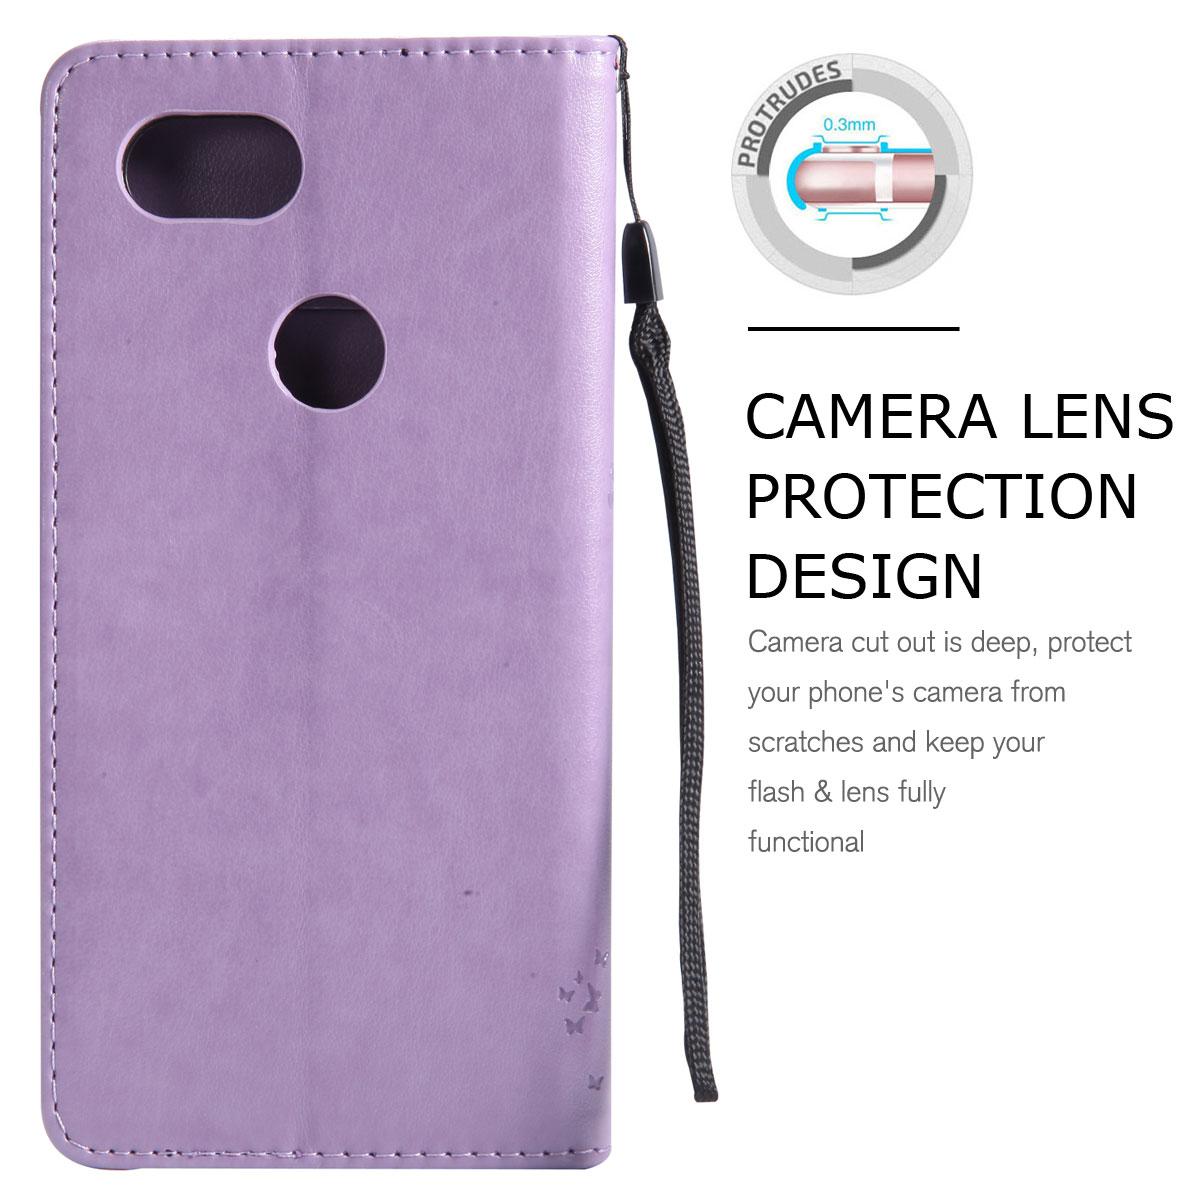 Magnetic-Leather-Credit-Card-Holder-Flip-Case-Cover-For-Google-Pixel-2-2-XL thumbnail 98